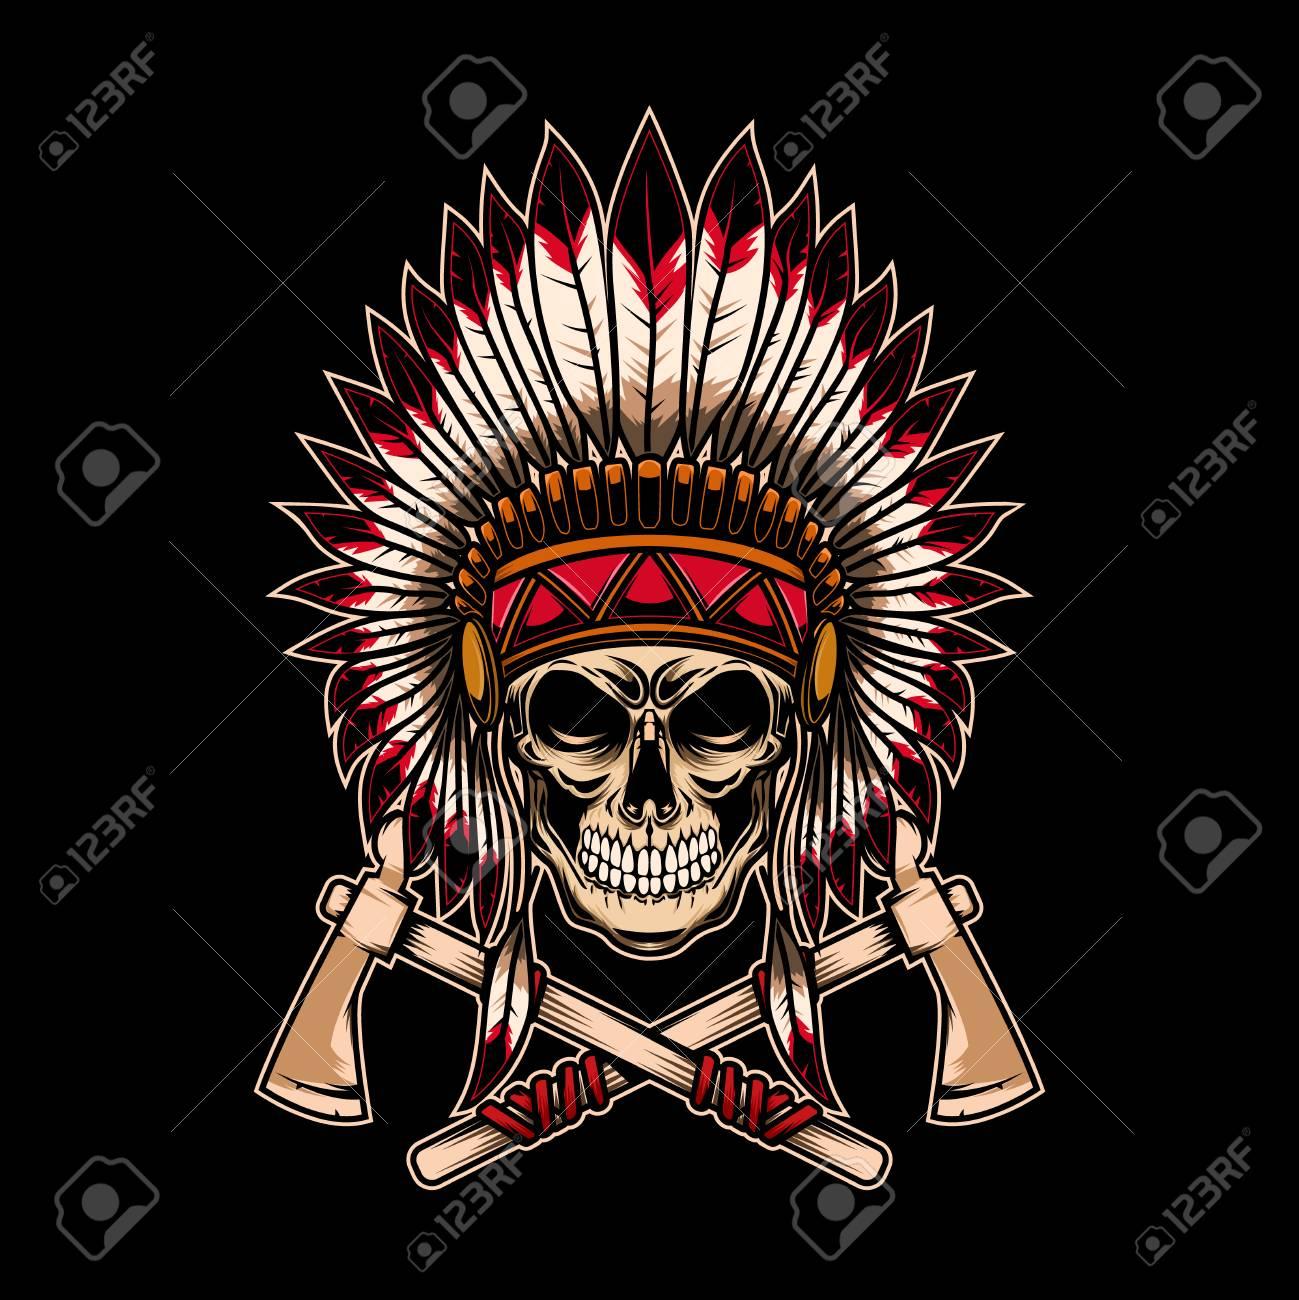 Native indian chief skull with crossed tomahawks on dark background. Design element for logo, label, emblem, sign. Vector illustration - 126631598